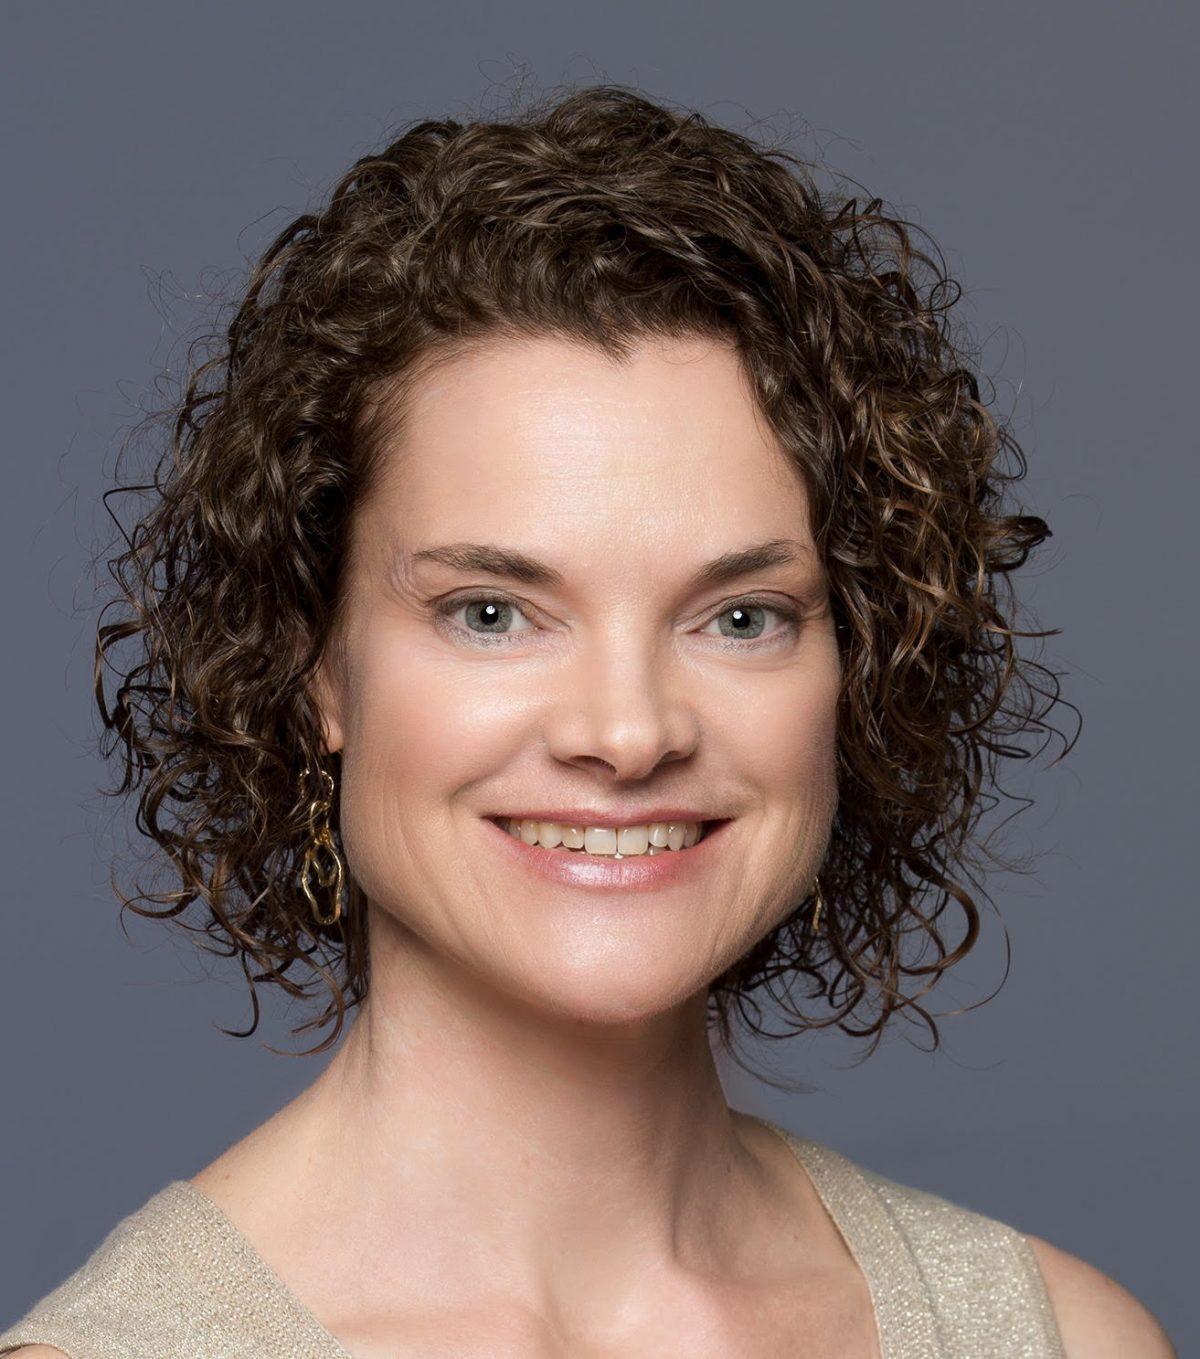 Lisa Medley, MA